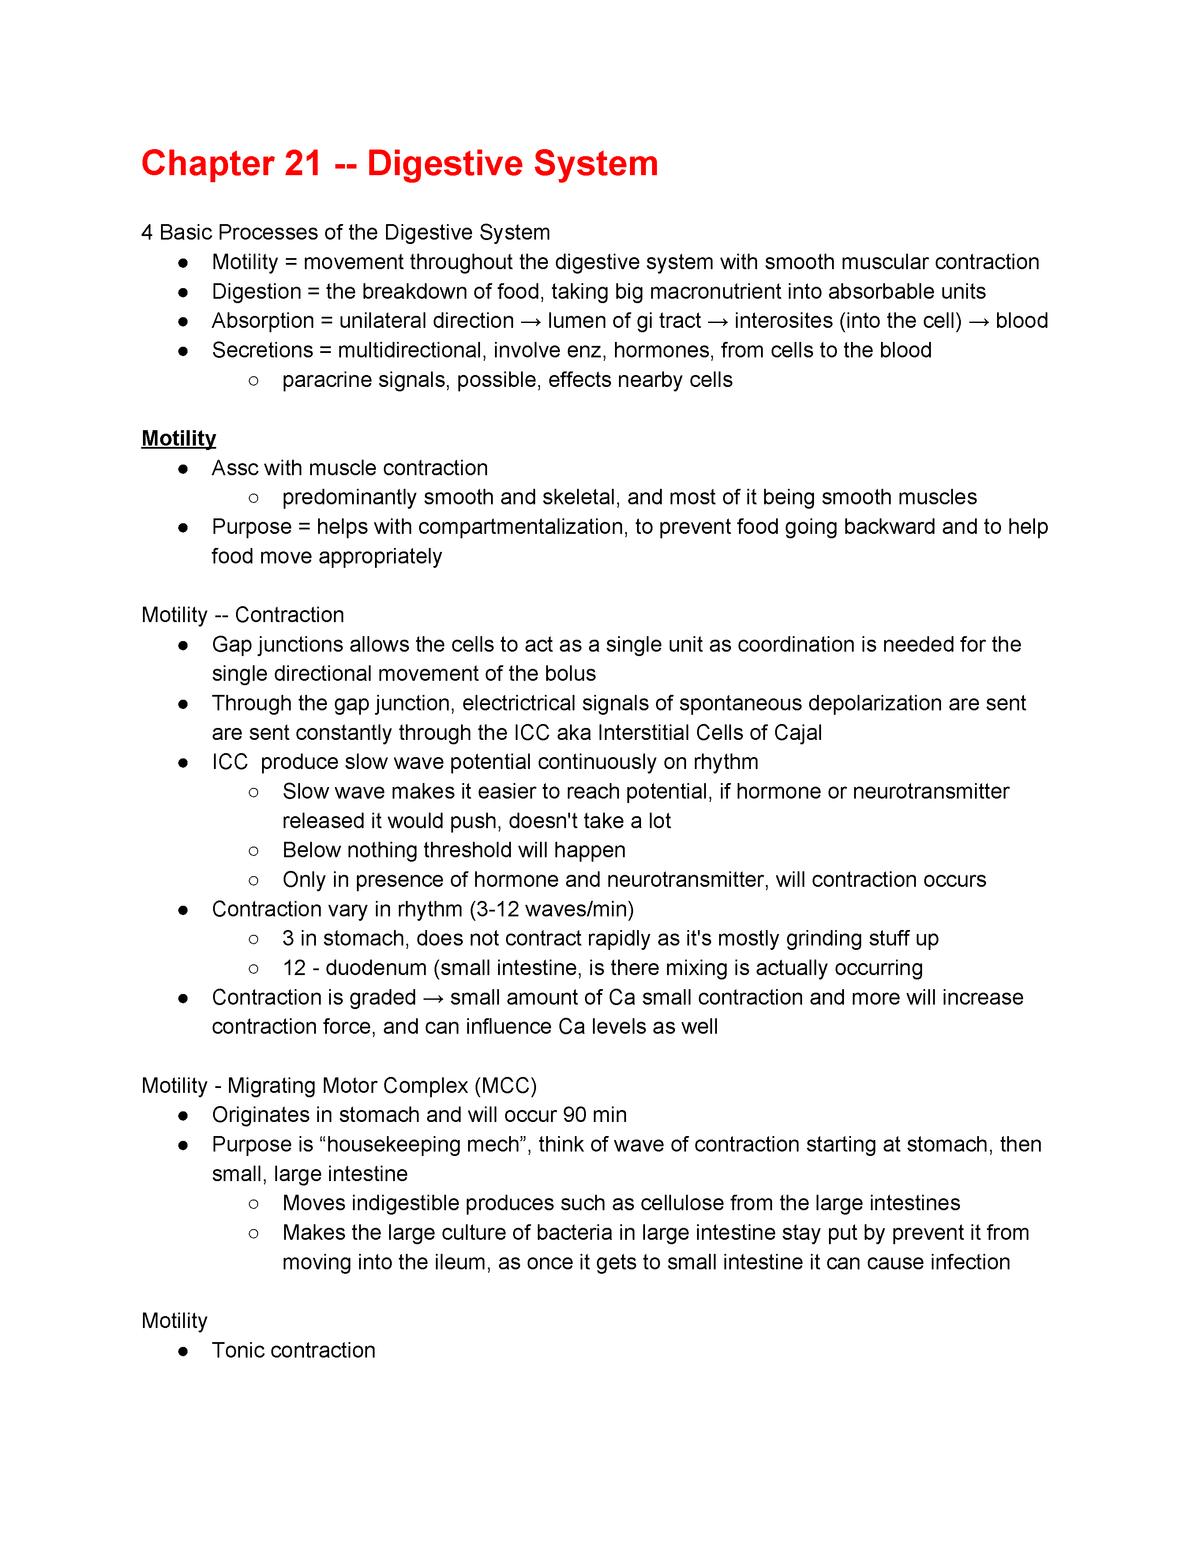 Physio 2 Exam 1 Notes - IPHY 3480: Human Physiology 2 - StuDocu